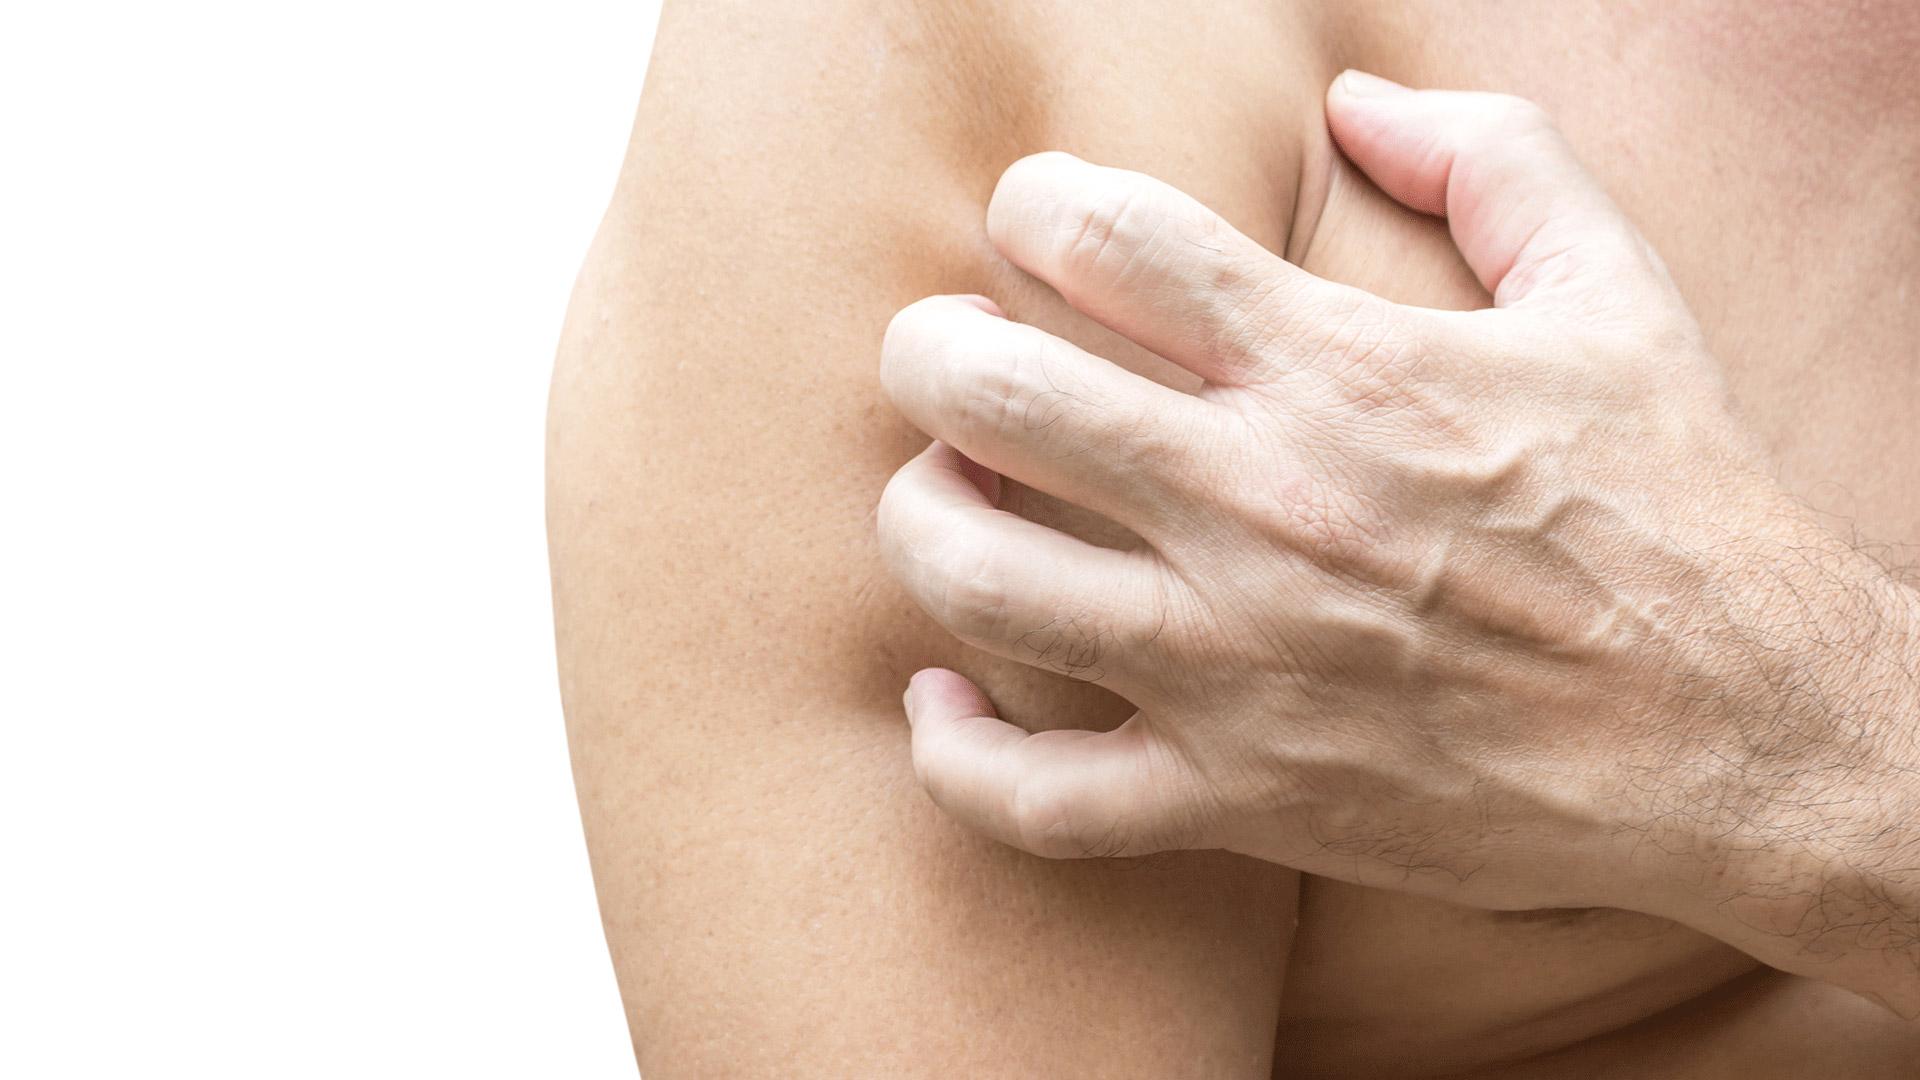 intim terület dermatitis